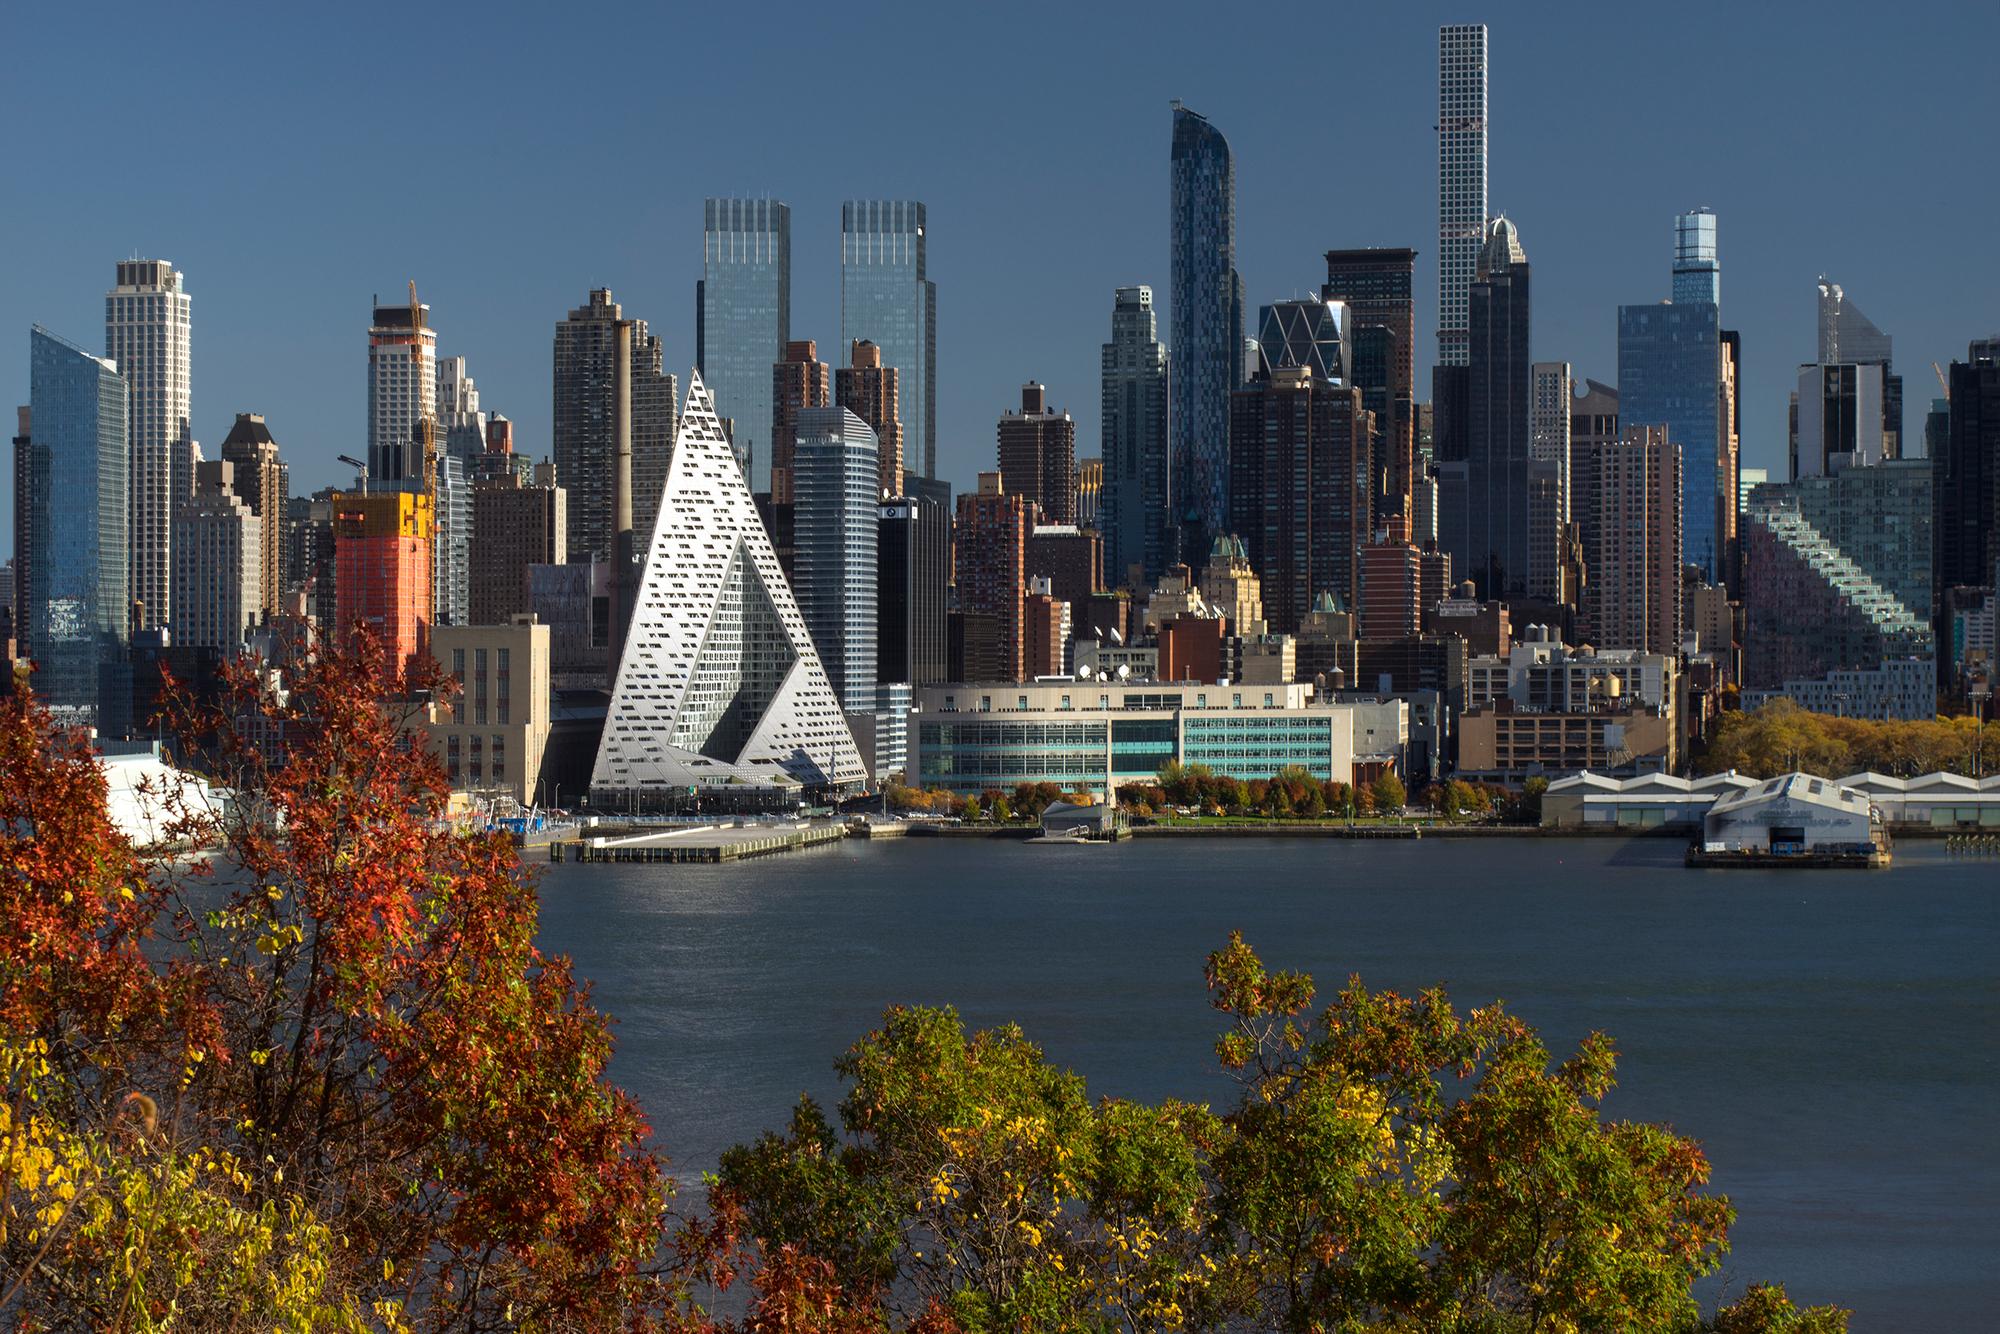 architecture cityscape new york city trees building water render skyscraper usa